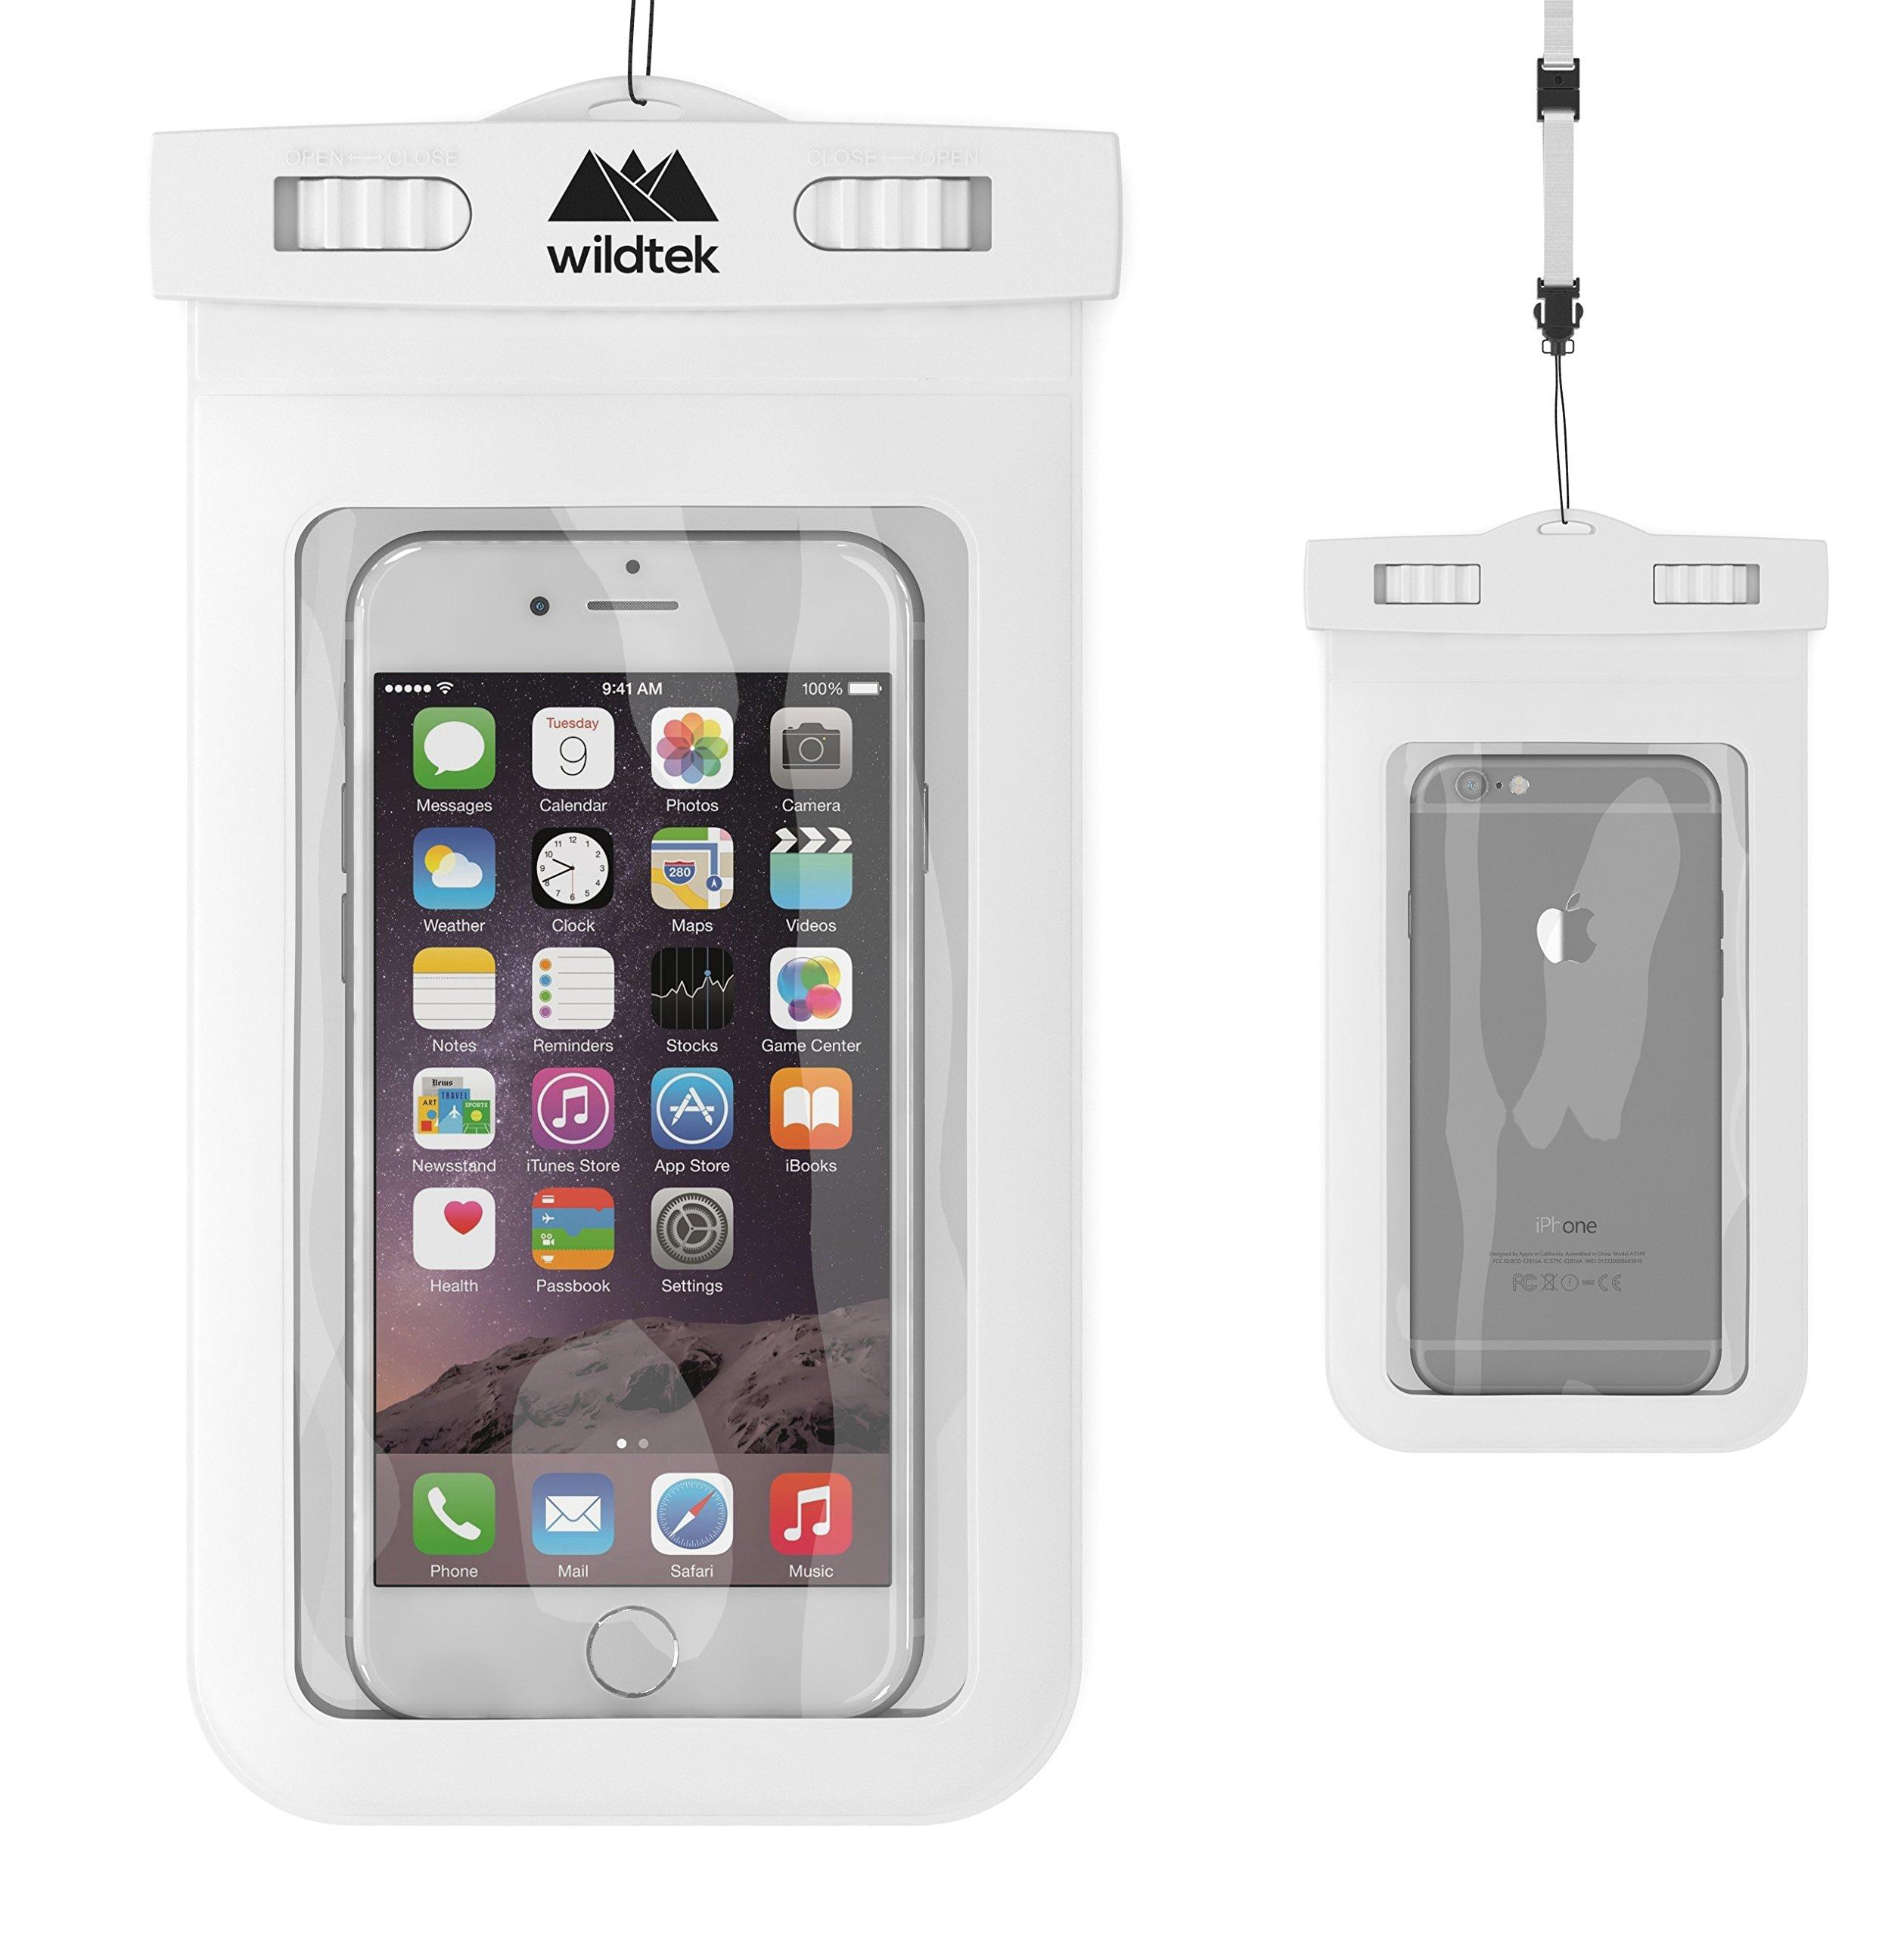 Wildtek Waterproof Case for iPhone 6, 6 plus, 5, 5s, 4, Samsung Galaxy S6, S5, S4, Samsung Note, GPS, mp3 Player, Passport - White